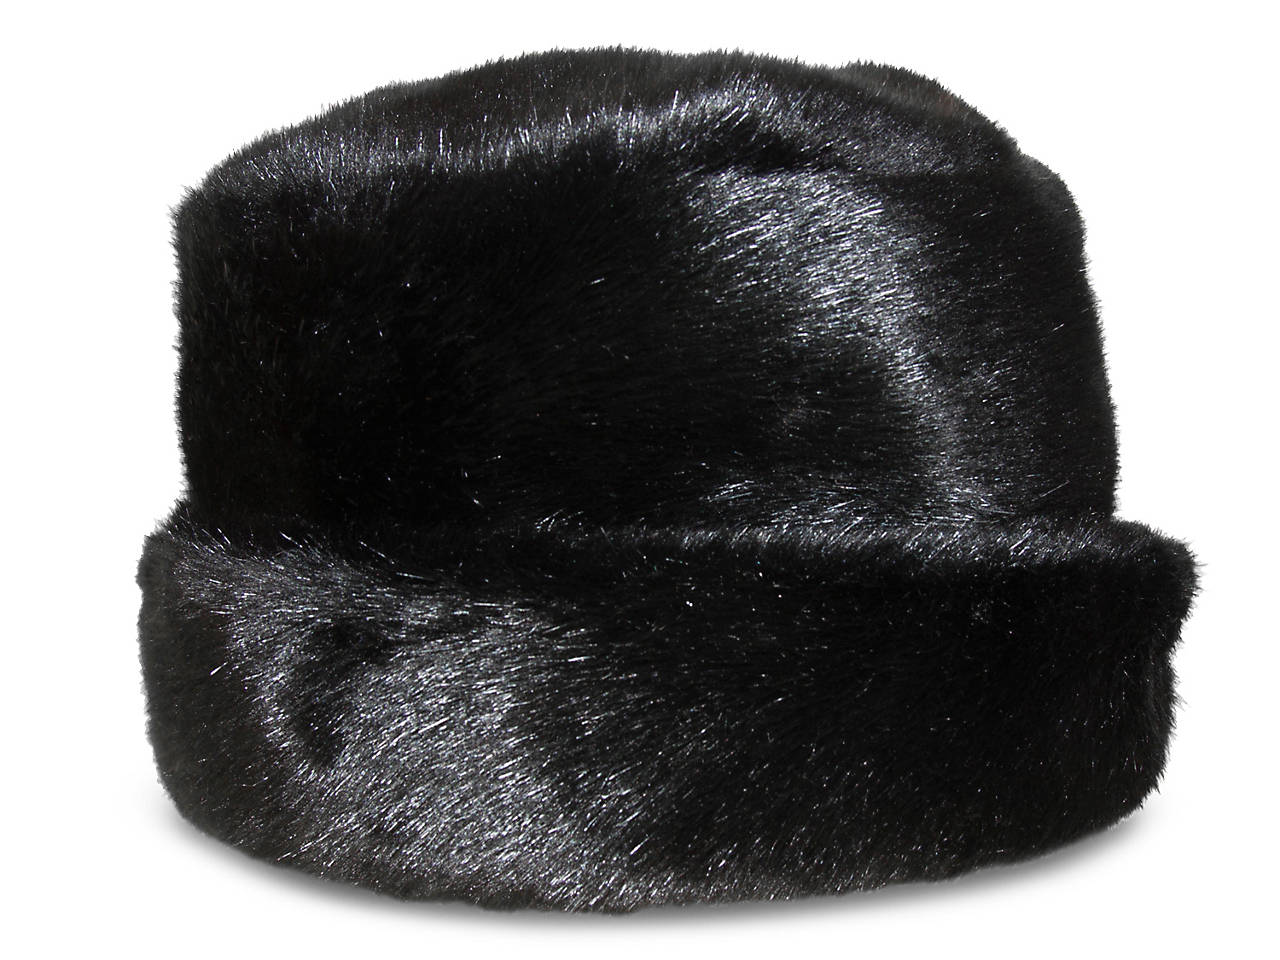 e4cf706a43f Nine West Faux Fur Cloche Hat Women s Handbags   Accessories